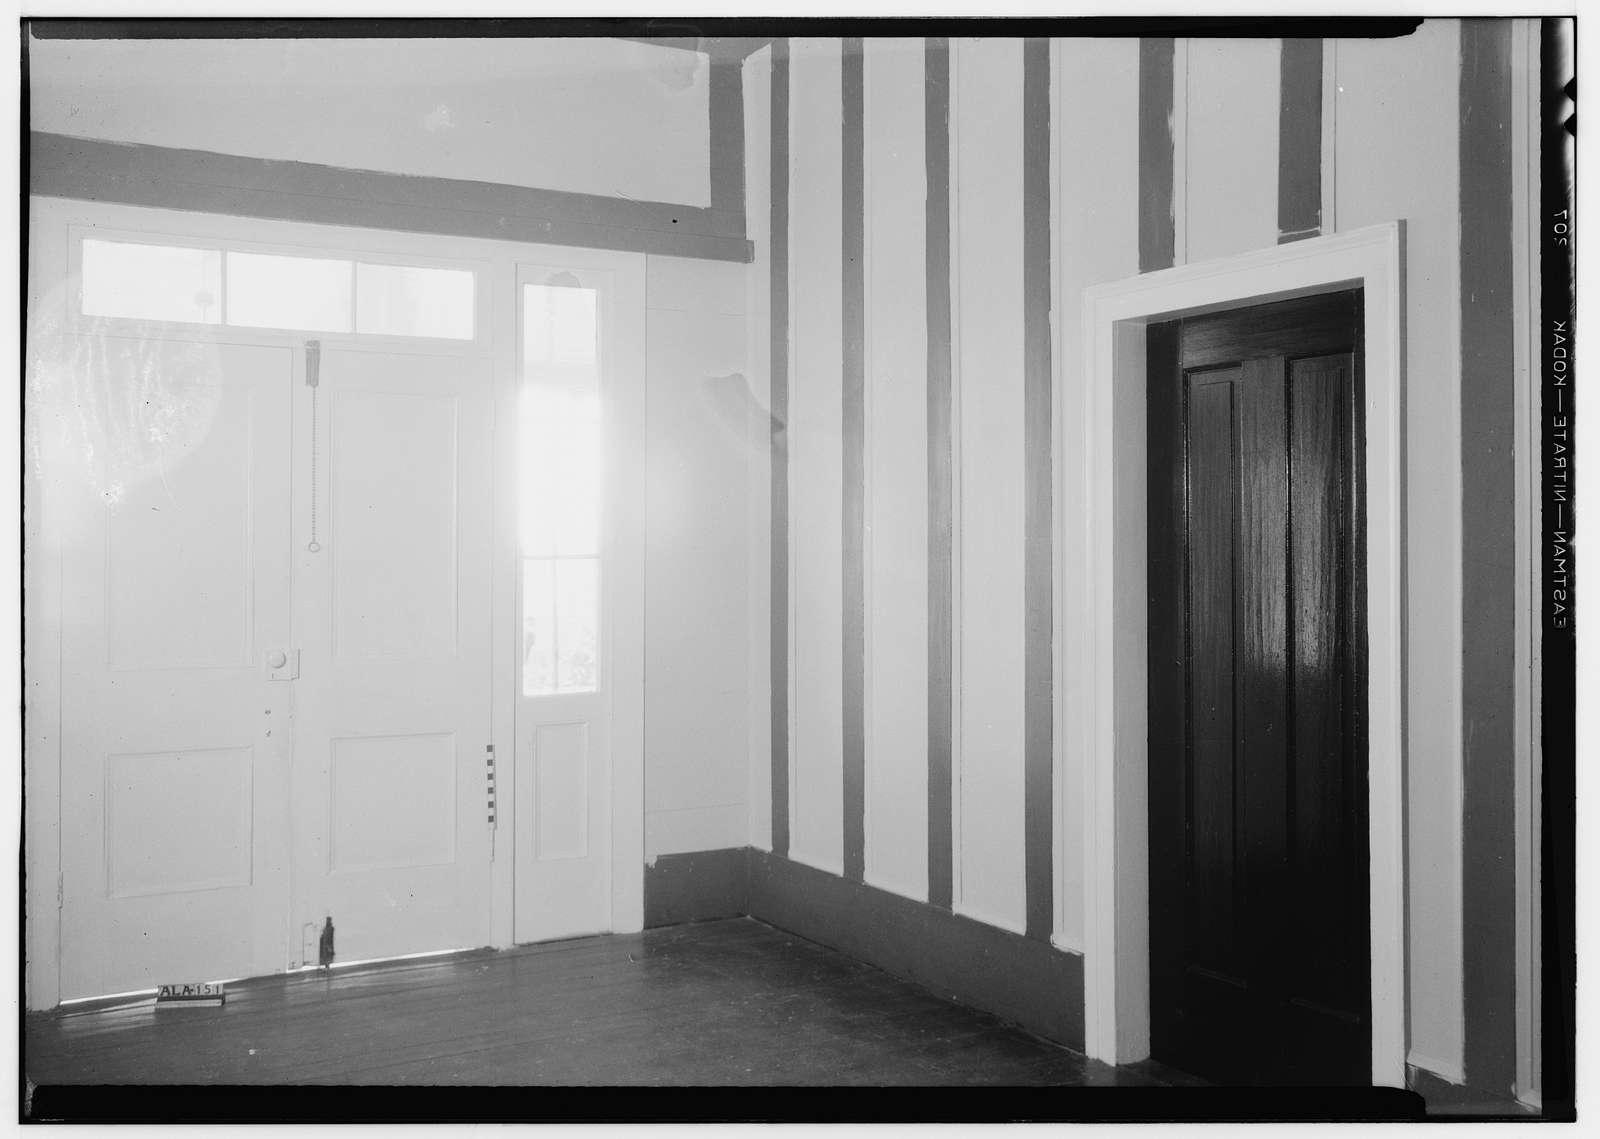 McIntosh House, Fail Street, Camden, Wilcox County, AL